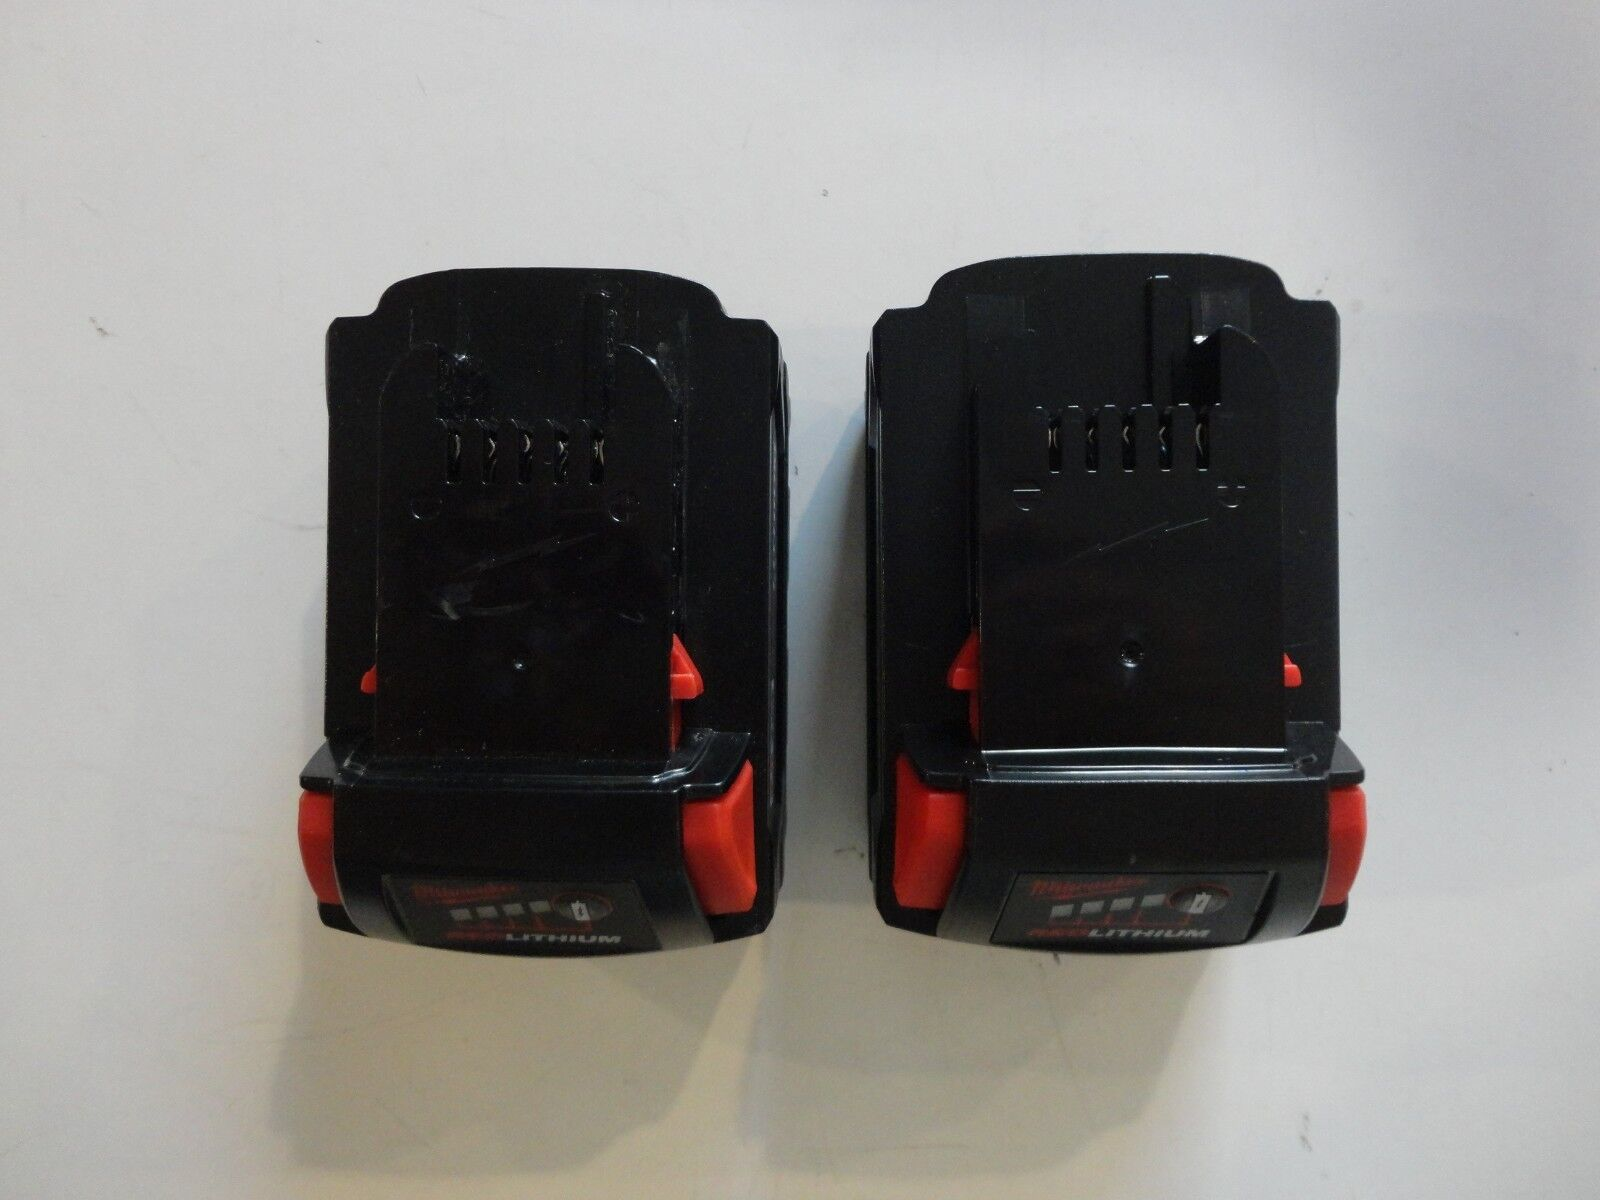 (2) MILWAUKEE 18V 18 Volt L i- Ion 48-11-1850 XC 5.0 AH Battery packs 48-11-1852 3